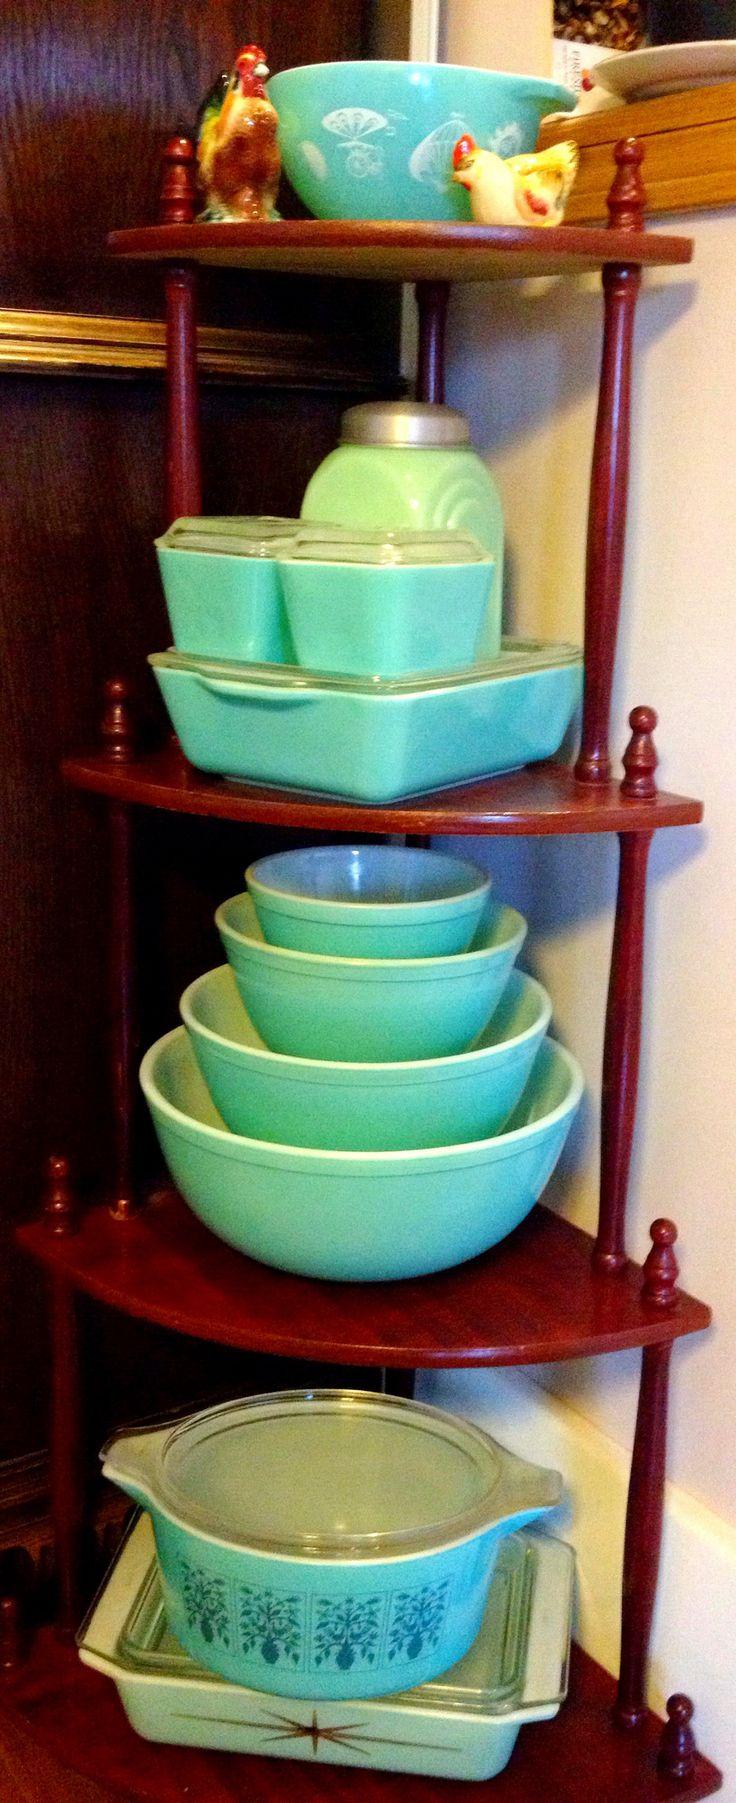 Turquoise Pyrex shapes #vintage #pyrex